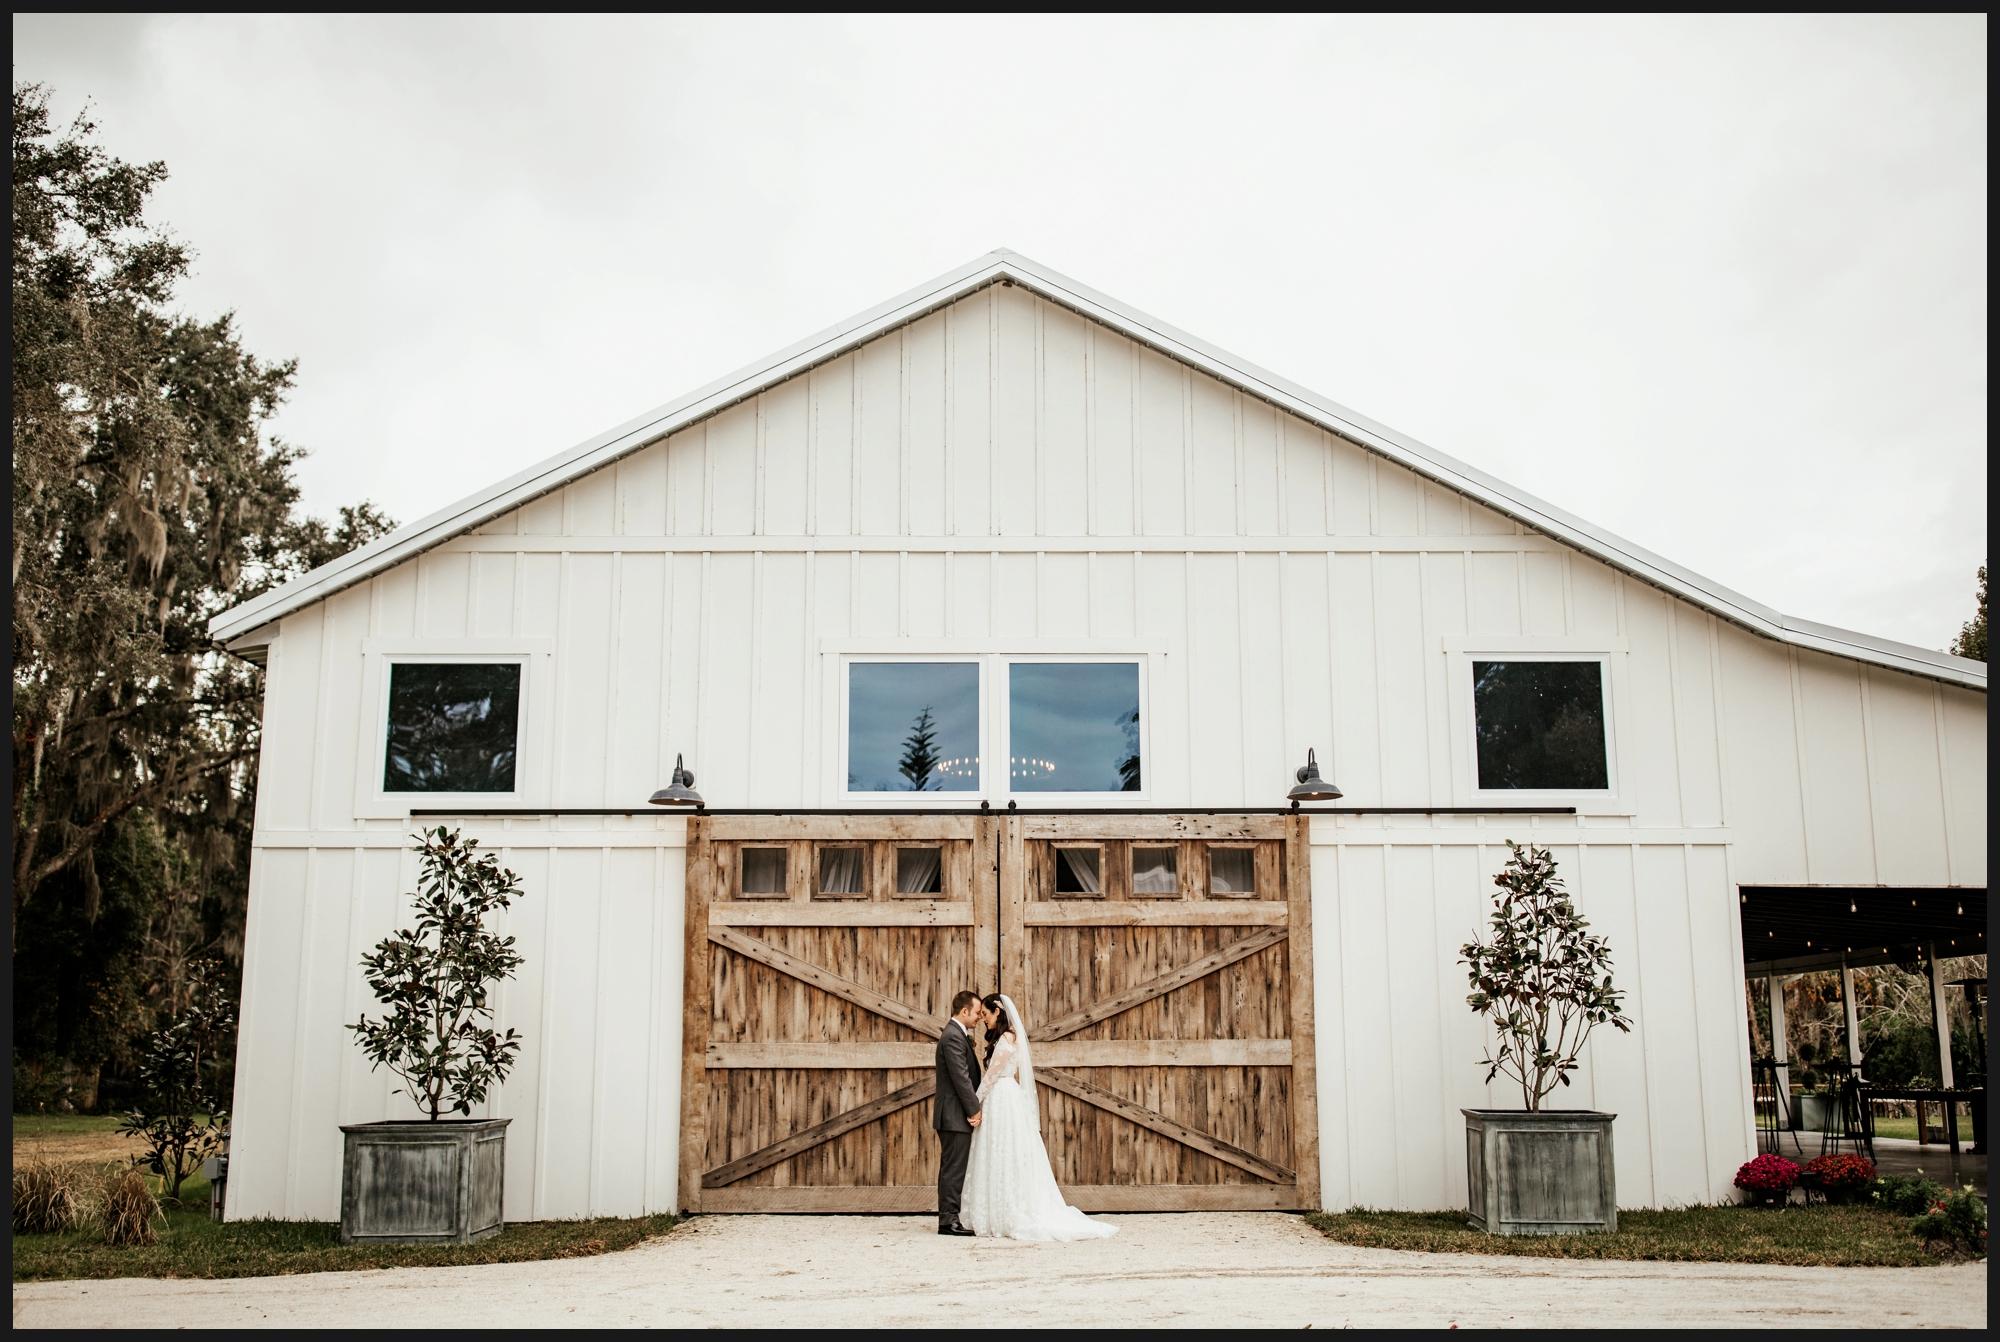 Orlando-Wedding-Photographer-destination-wedding-photographer-florida-wedding-photographer-hawaii-wedding-photographer_0507.jpg